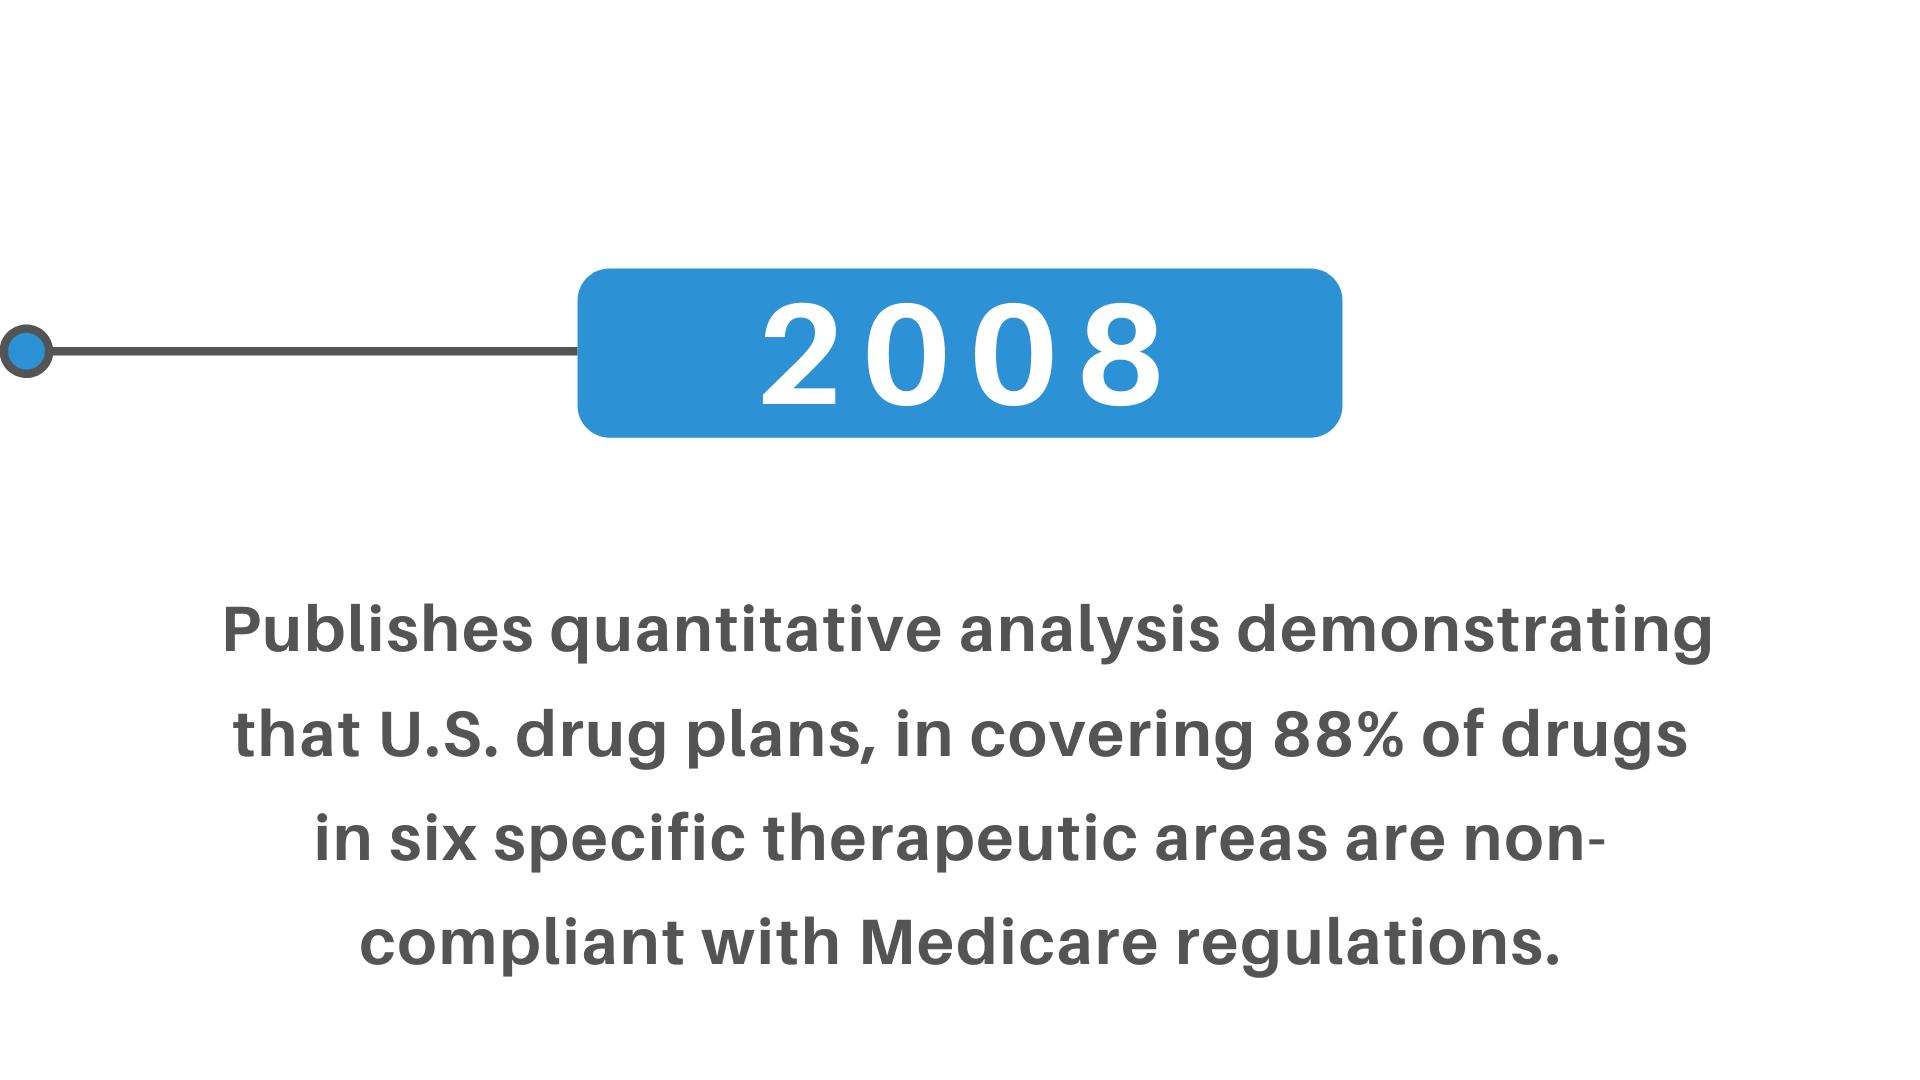 US drug plans 88% therapeutic non-compliant medicare regulations